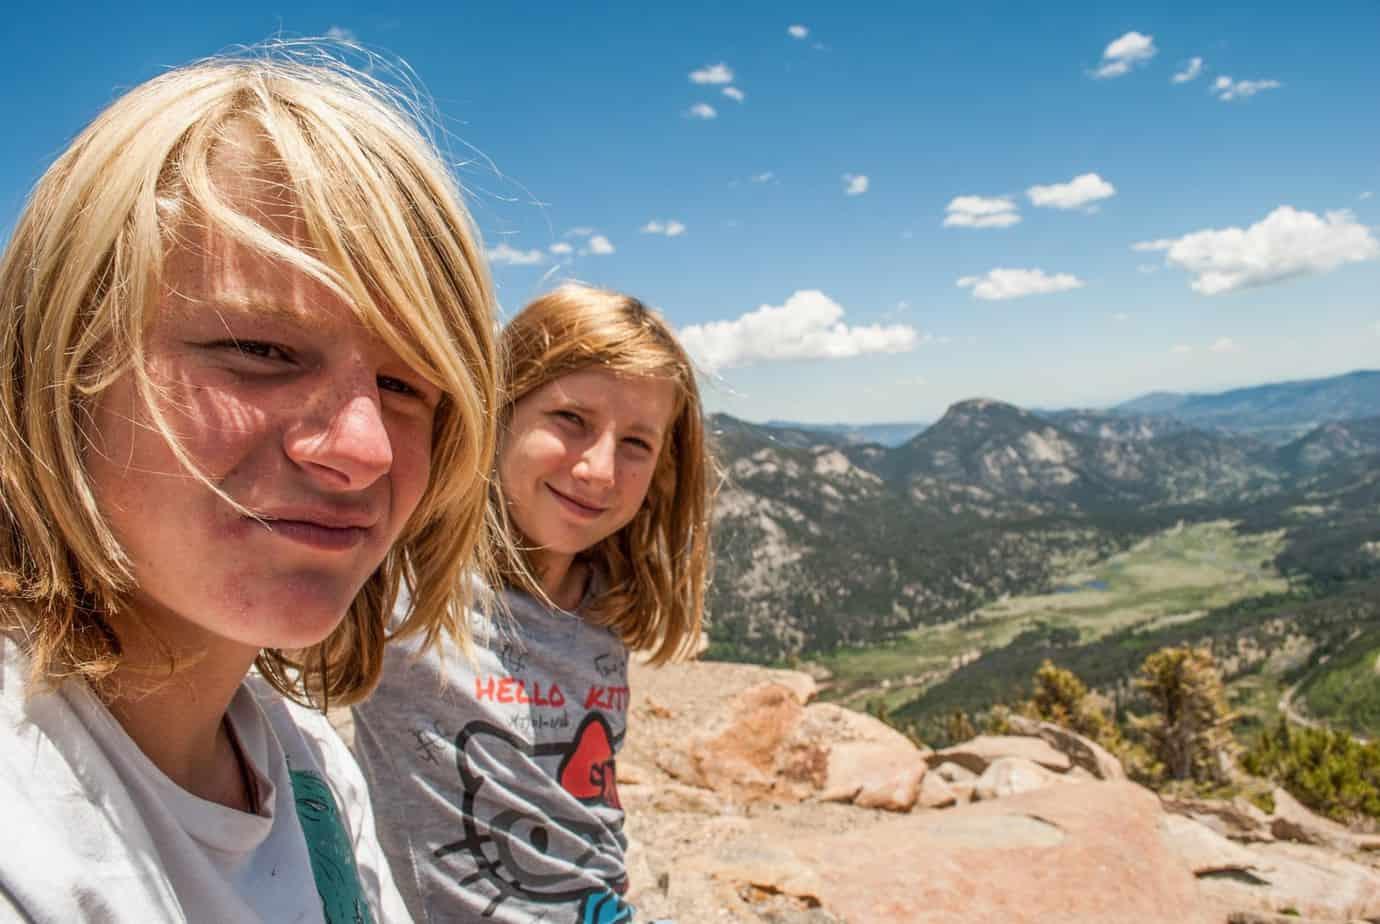 Keelan and Jessica, Rocky Mountain NP